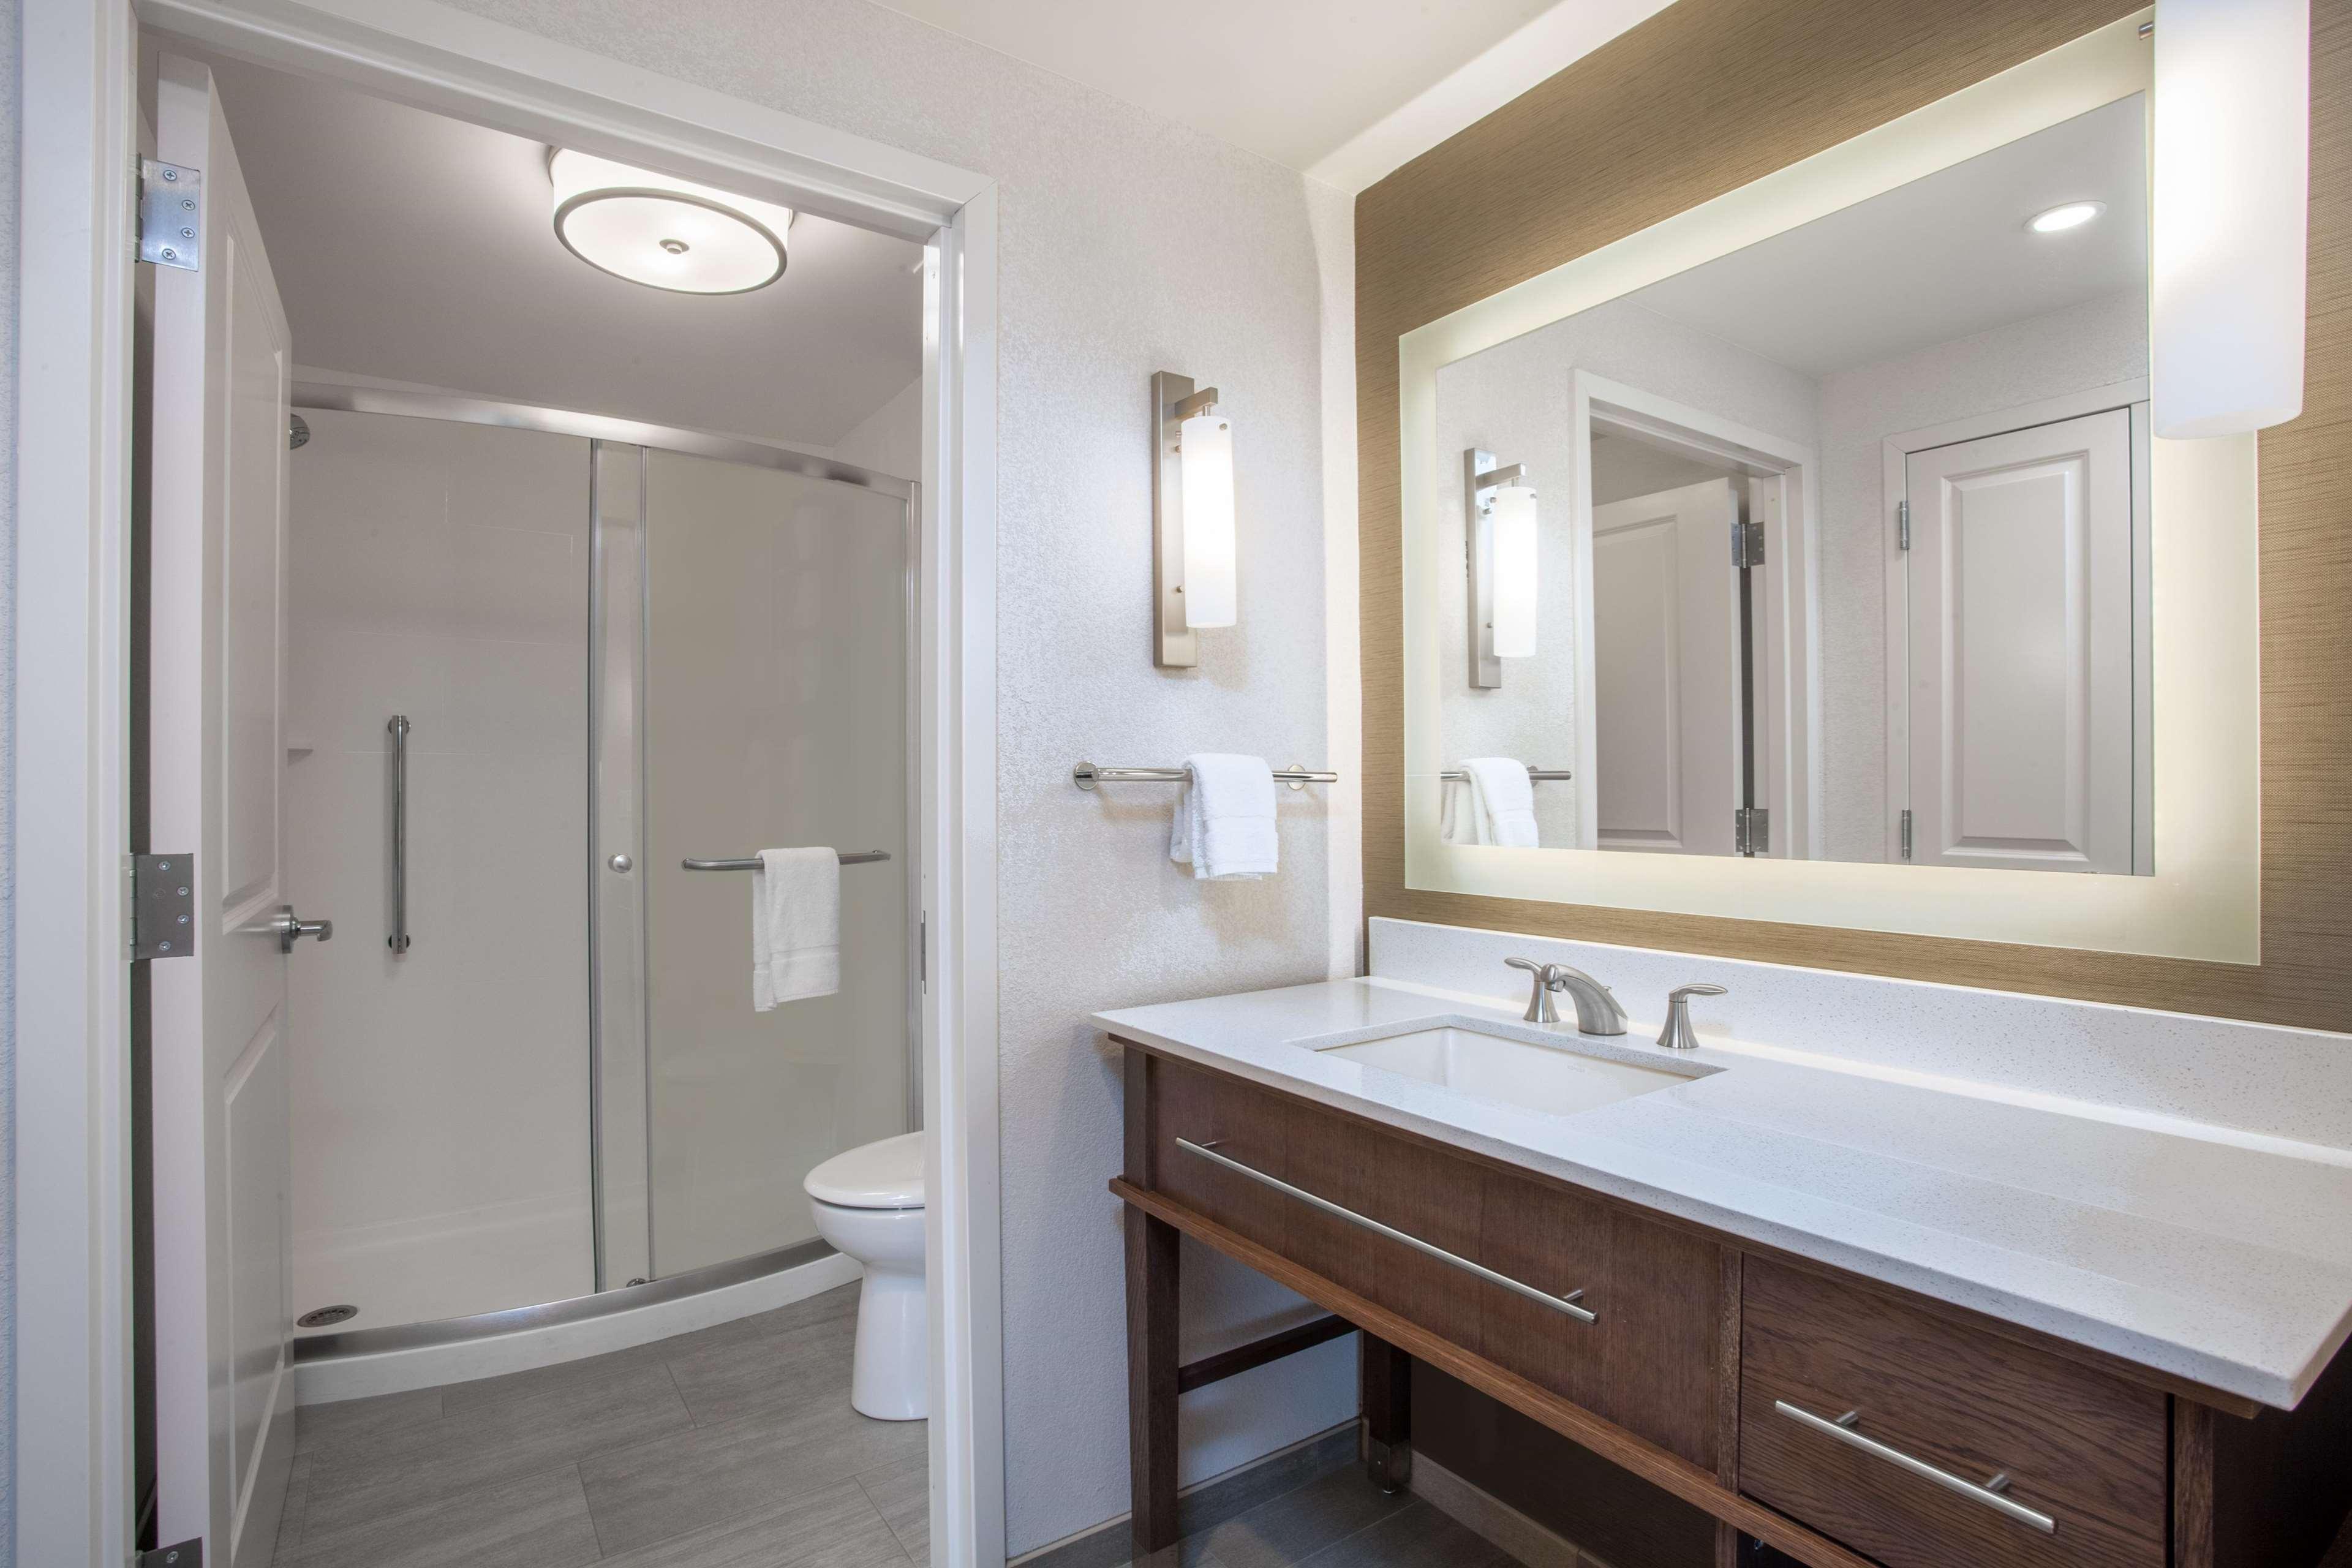 Homewood Suites by Hilton Saratoga Springs image 31